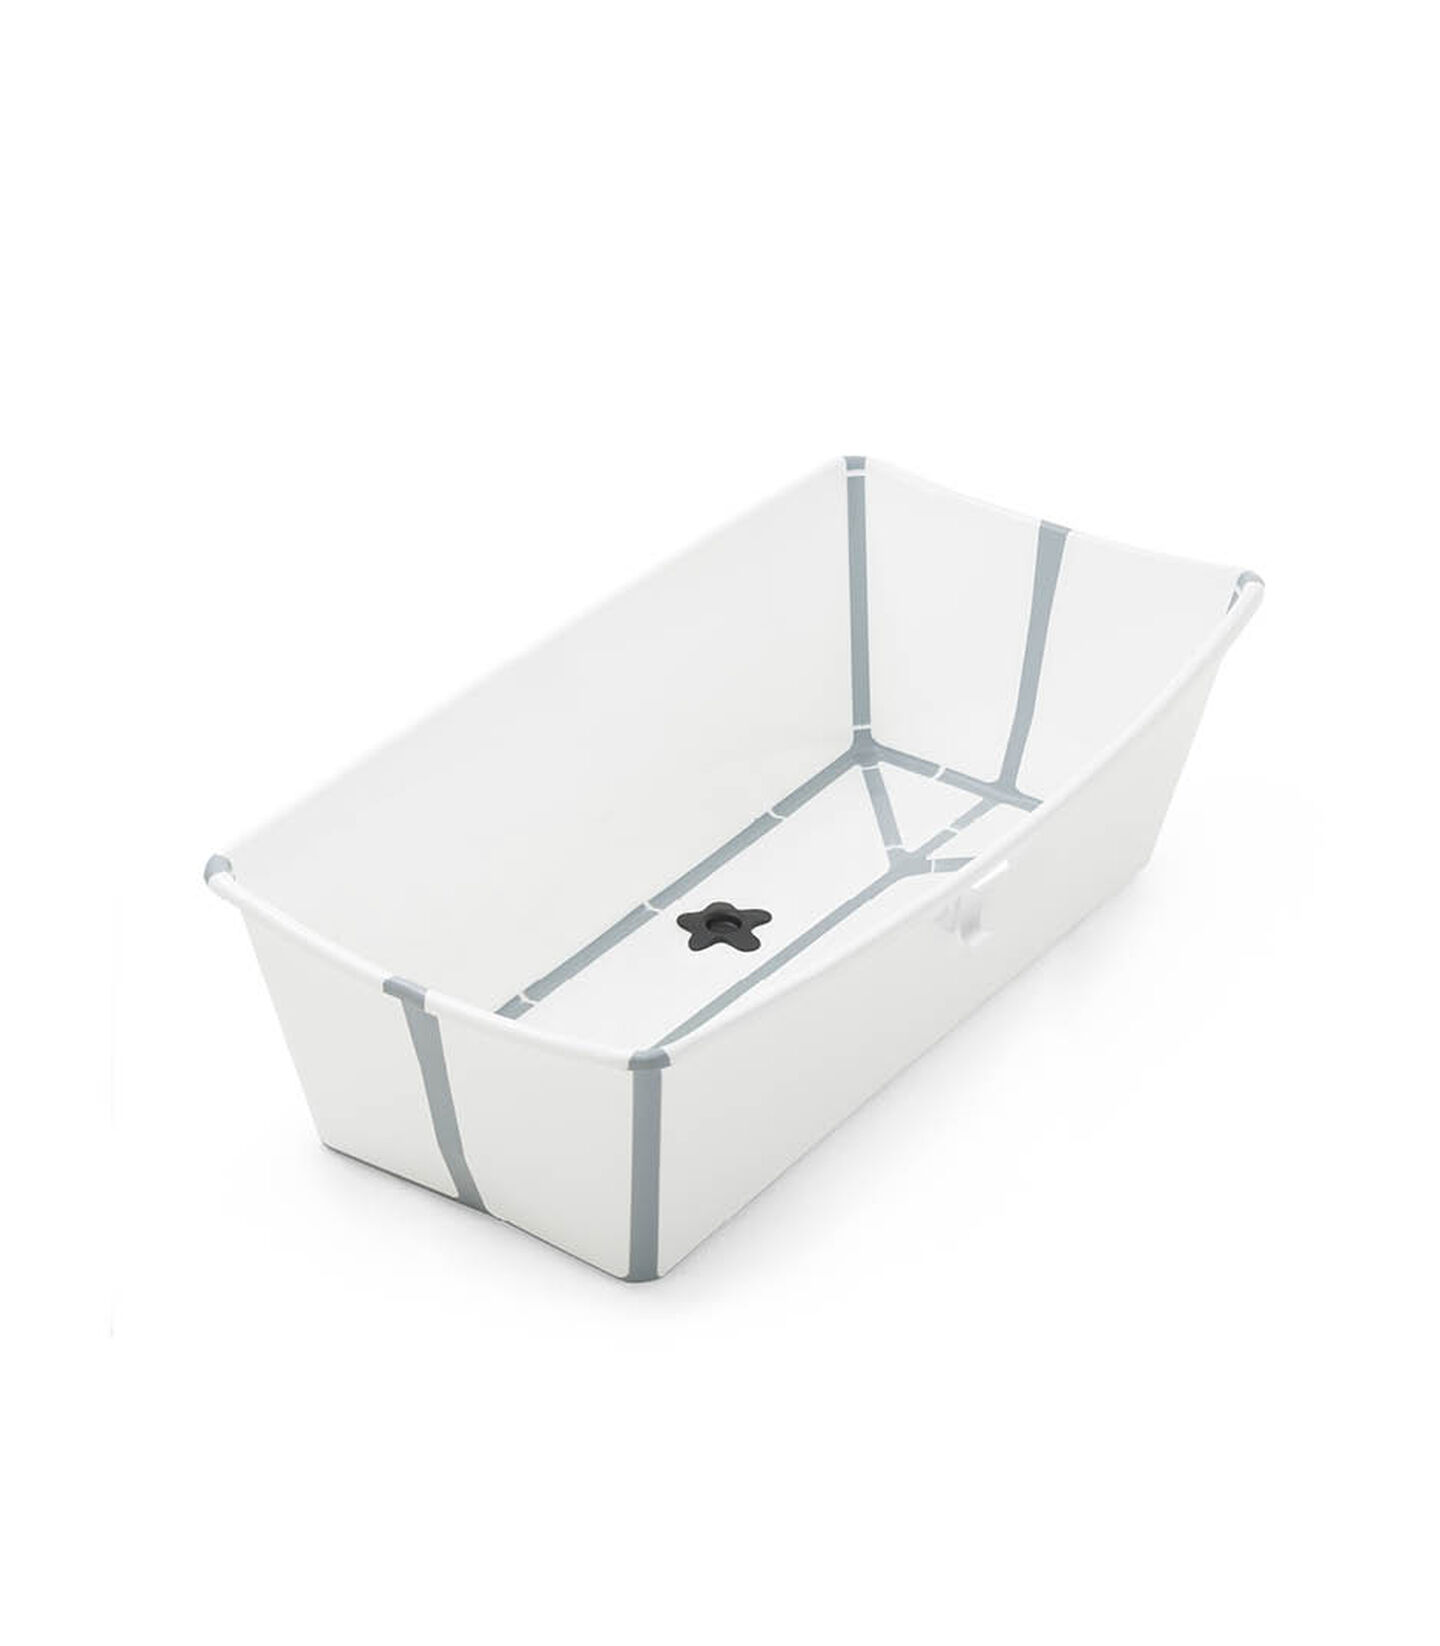 Stokke® Flexi Bath ® Large White, Bianco, mainview view 1